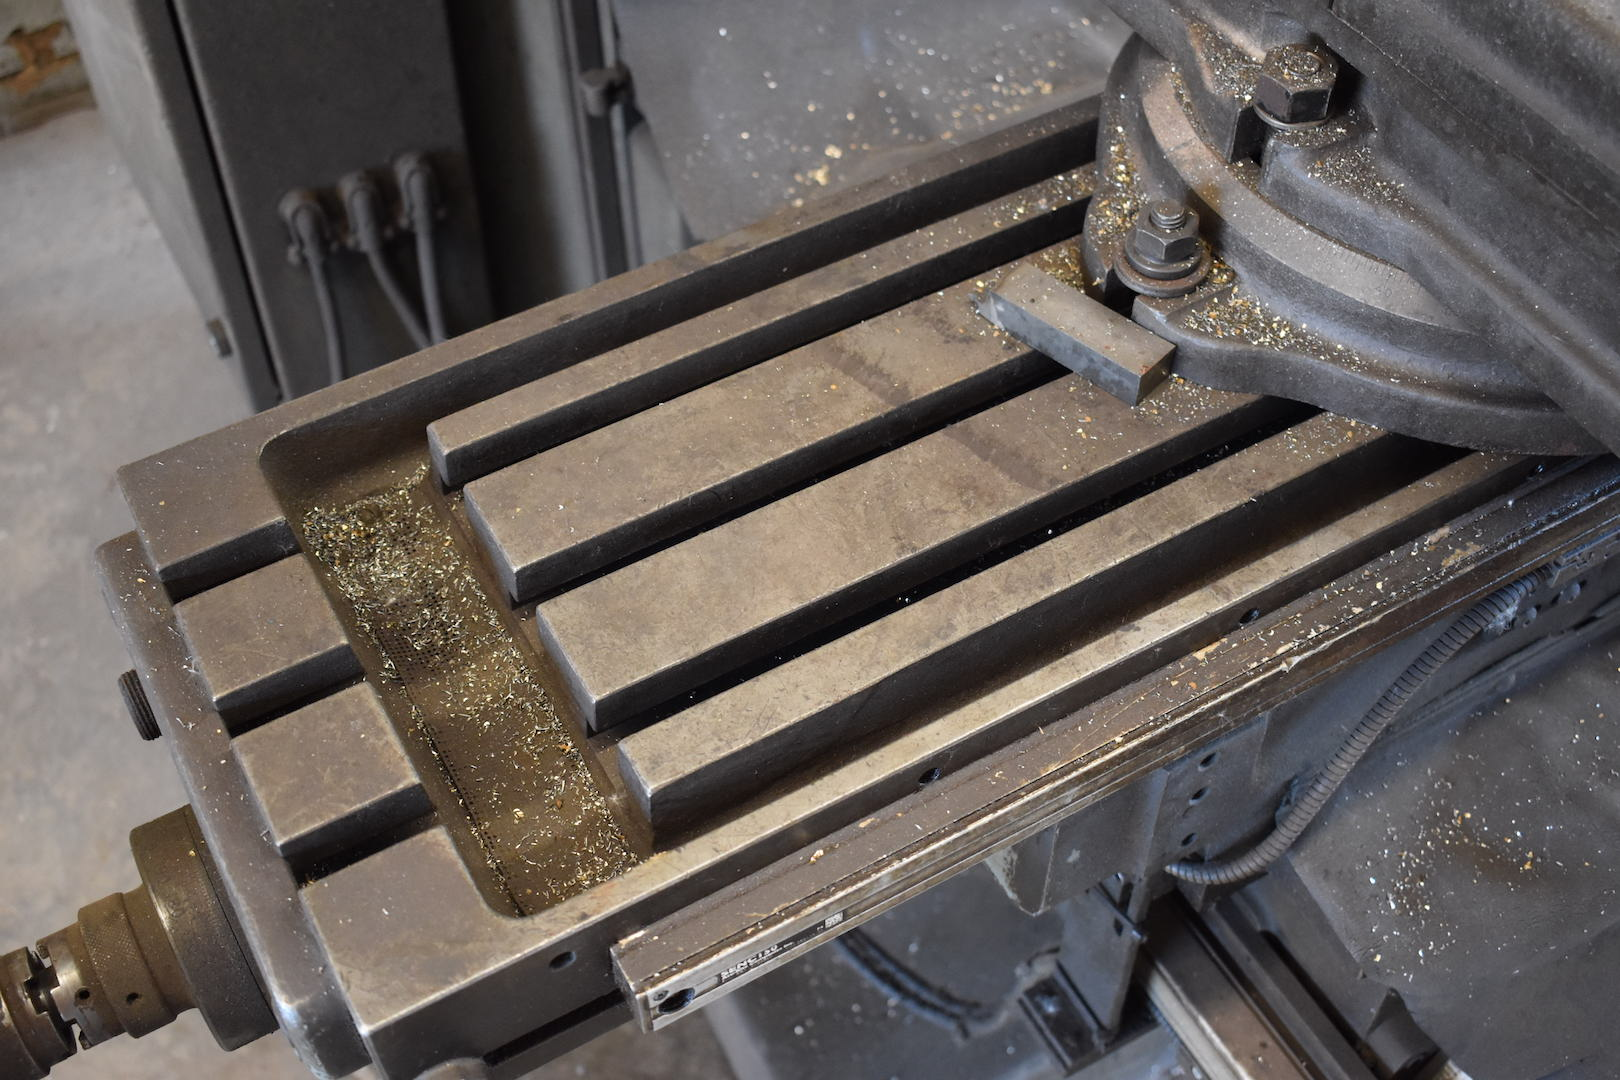 Lot 84 - Gorton 2 HP Model 1-22 Mastermil Vertical Milling Machine, S/N 49726, 10 in. x 42 in. T-Slot